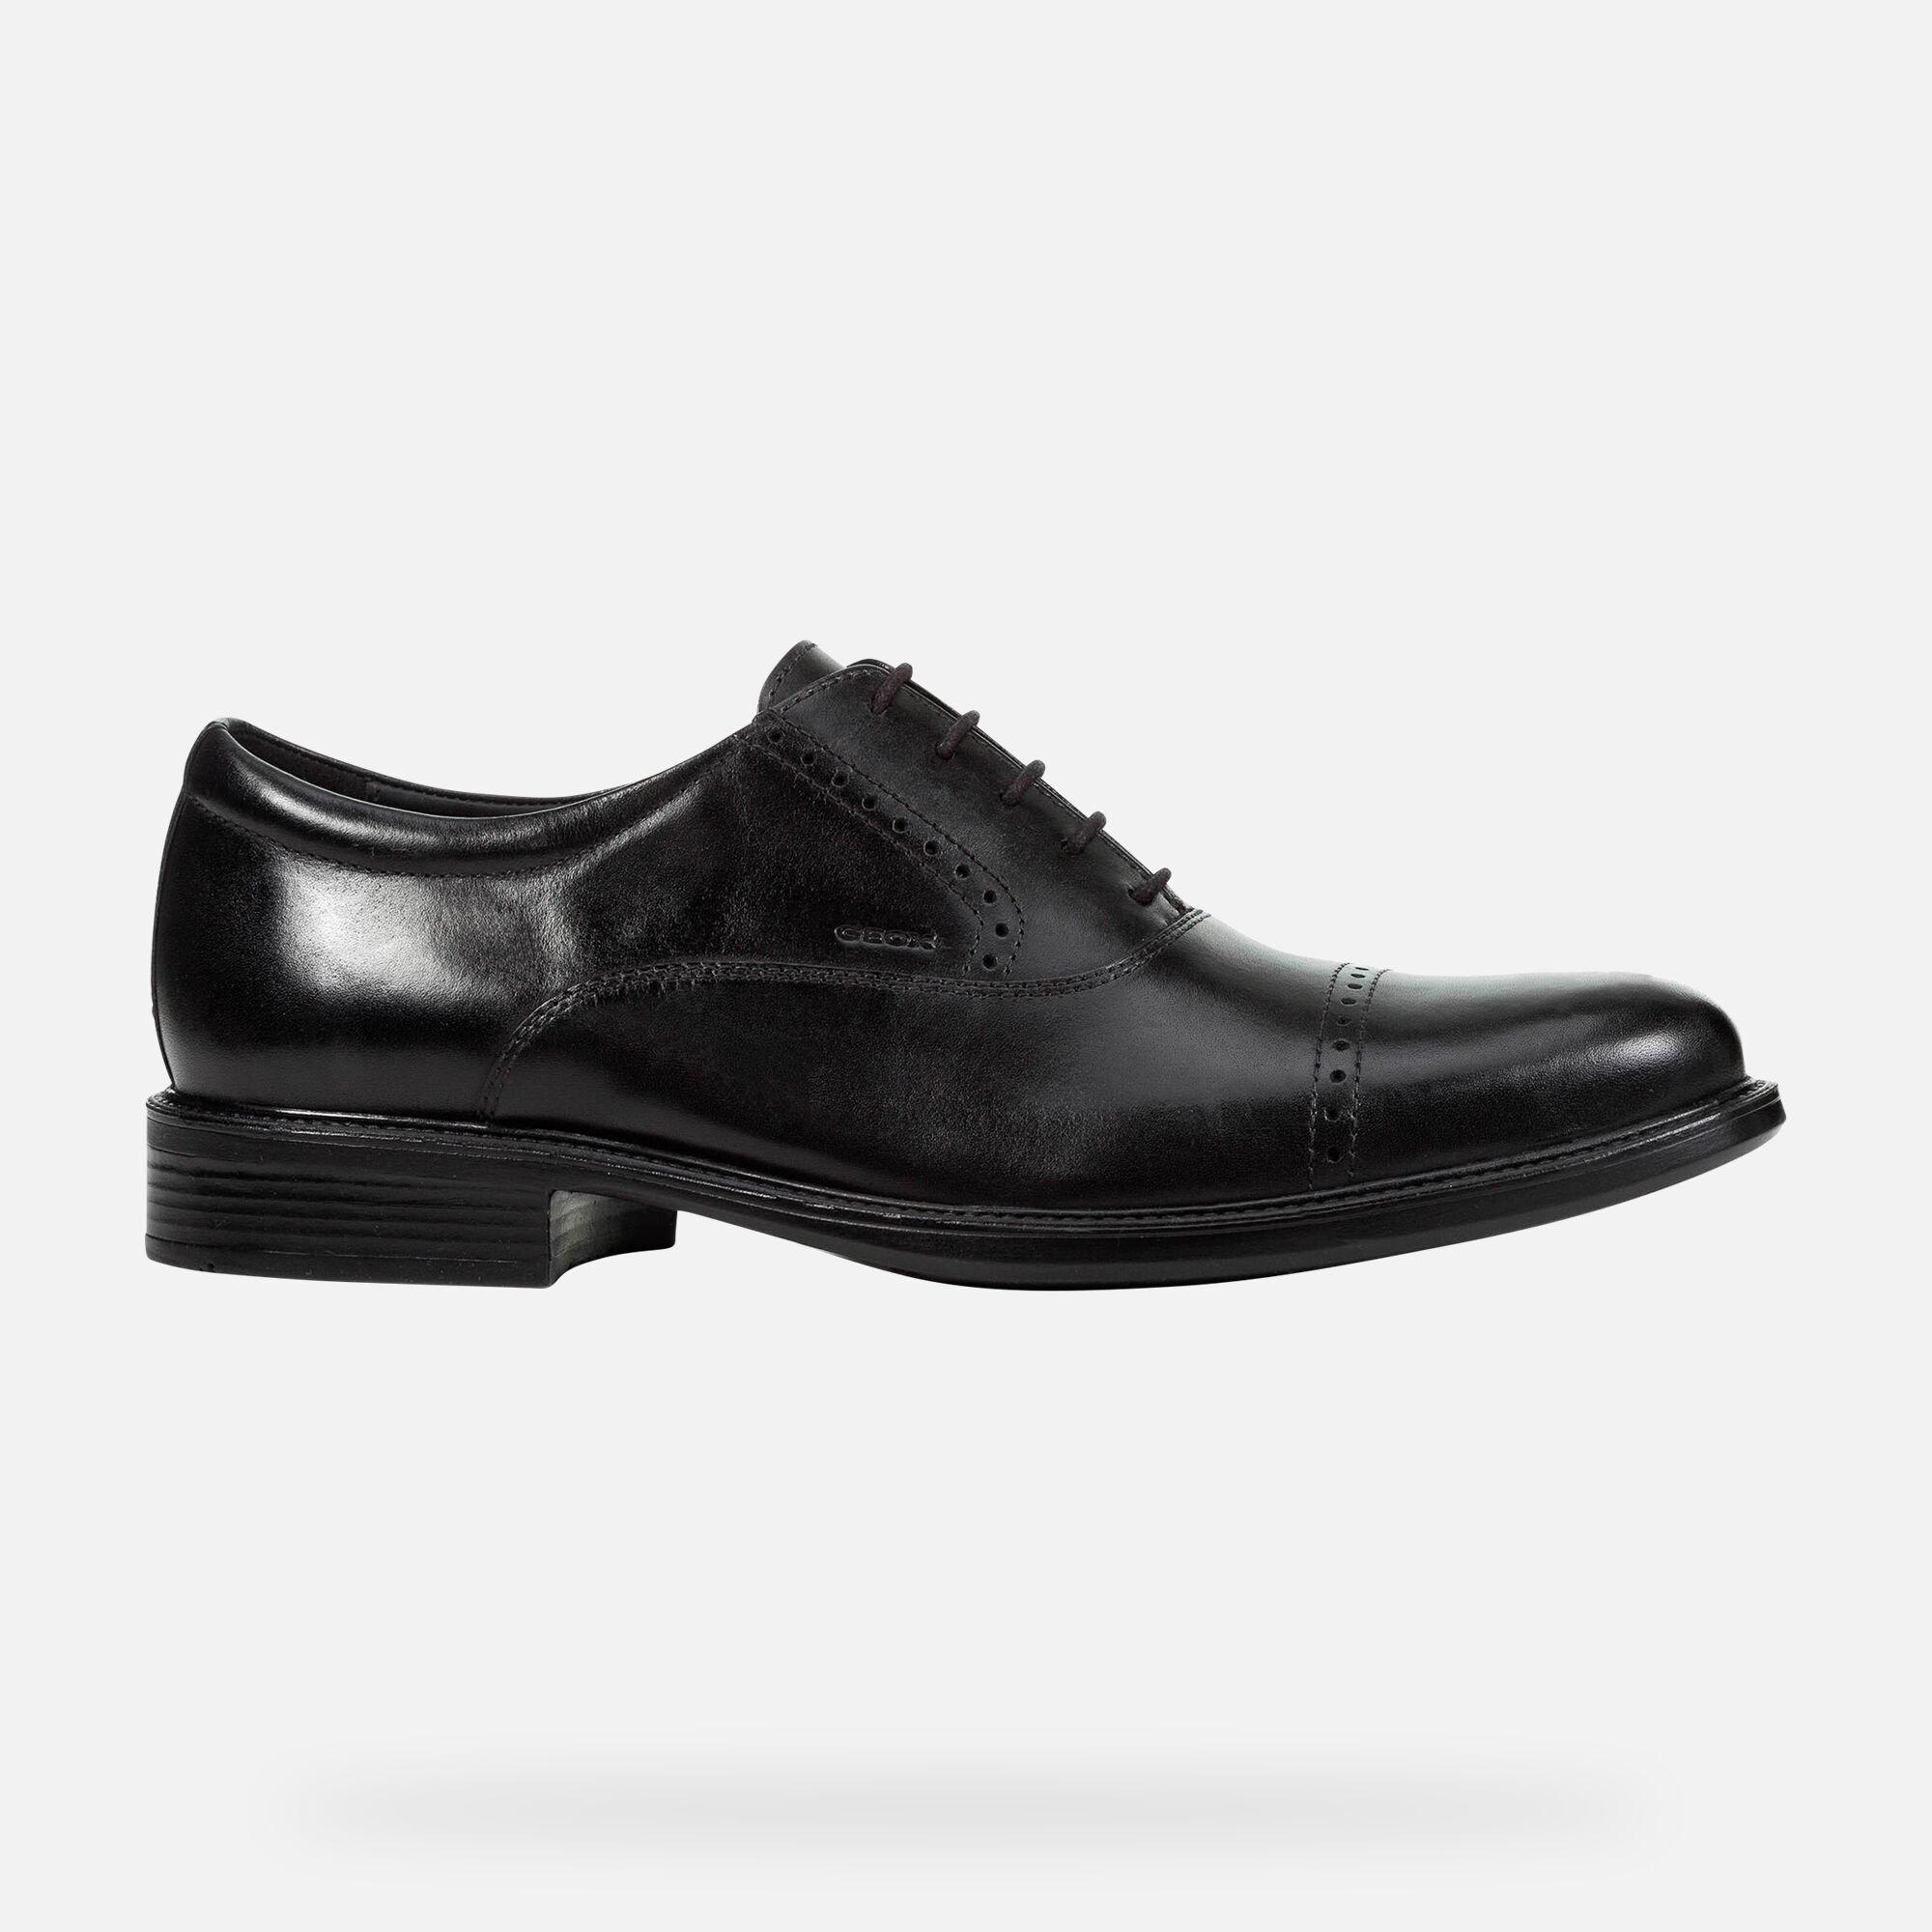 Geox UOMO CARNABY: Black Man Shoes | Geox SS19